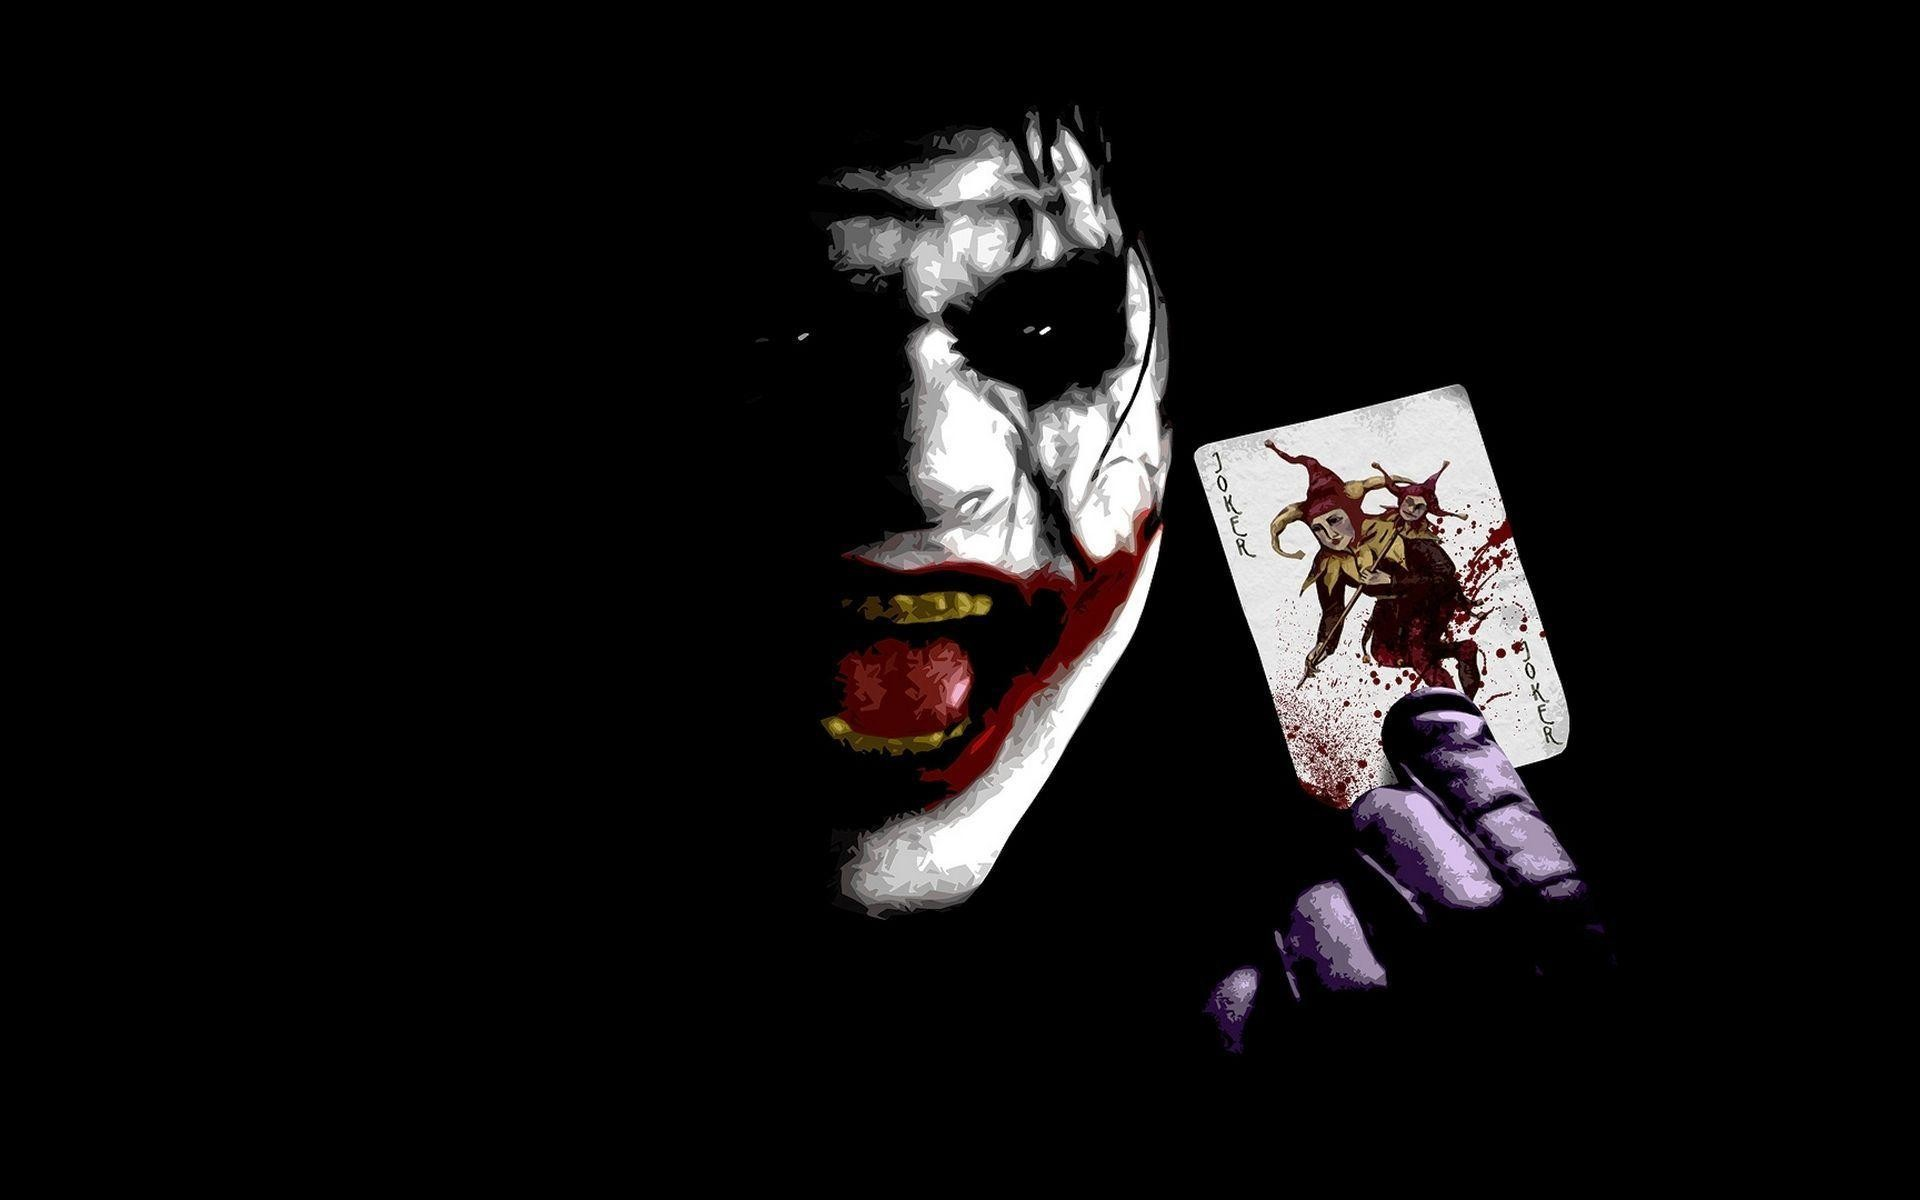 Clown Wallpapers – Full HD wallpaper search